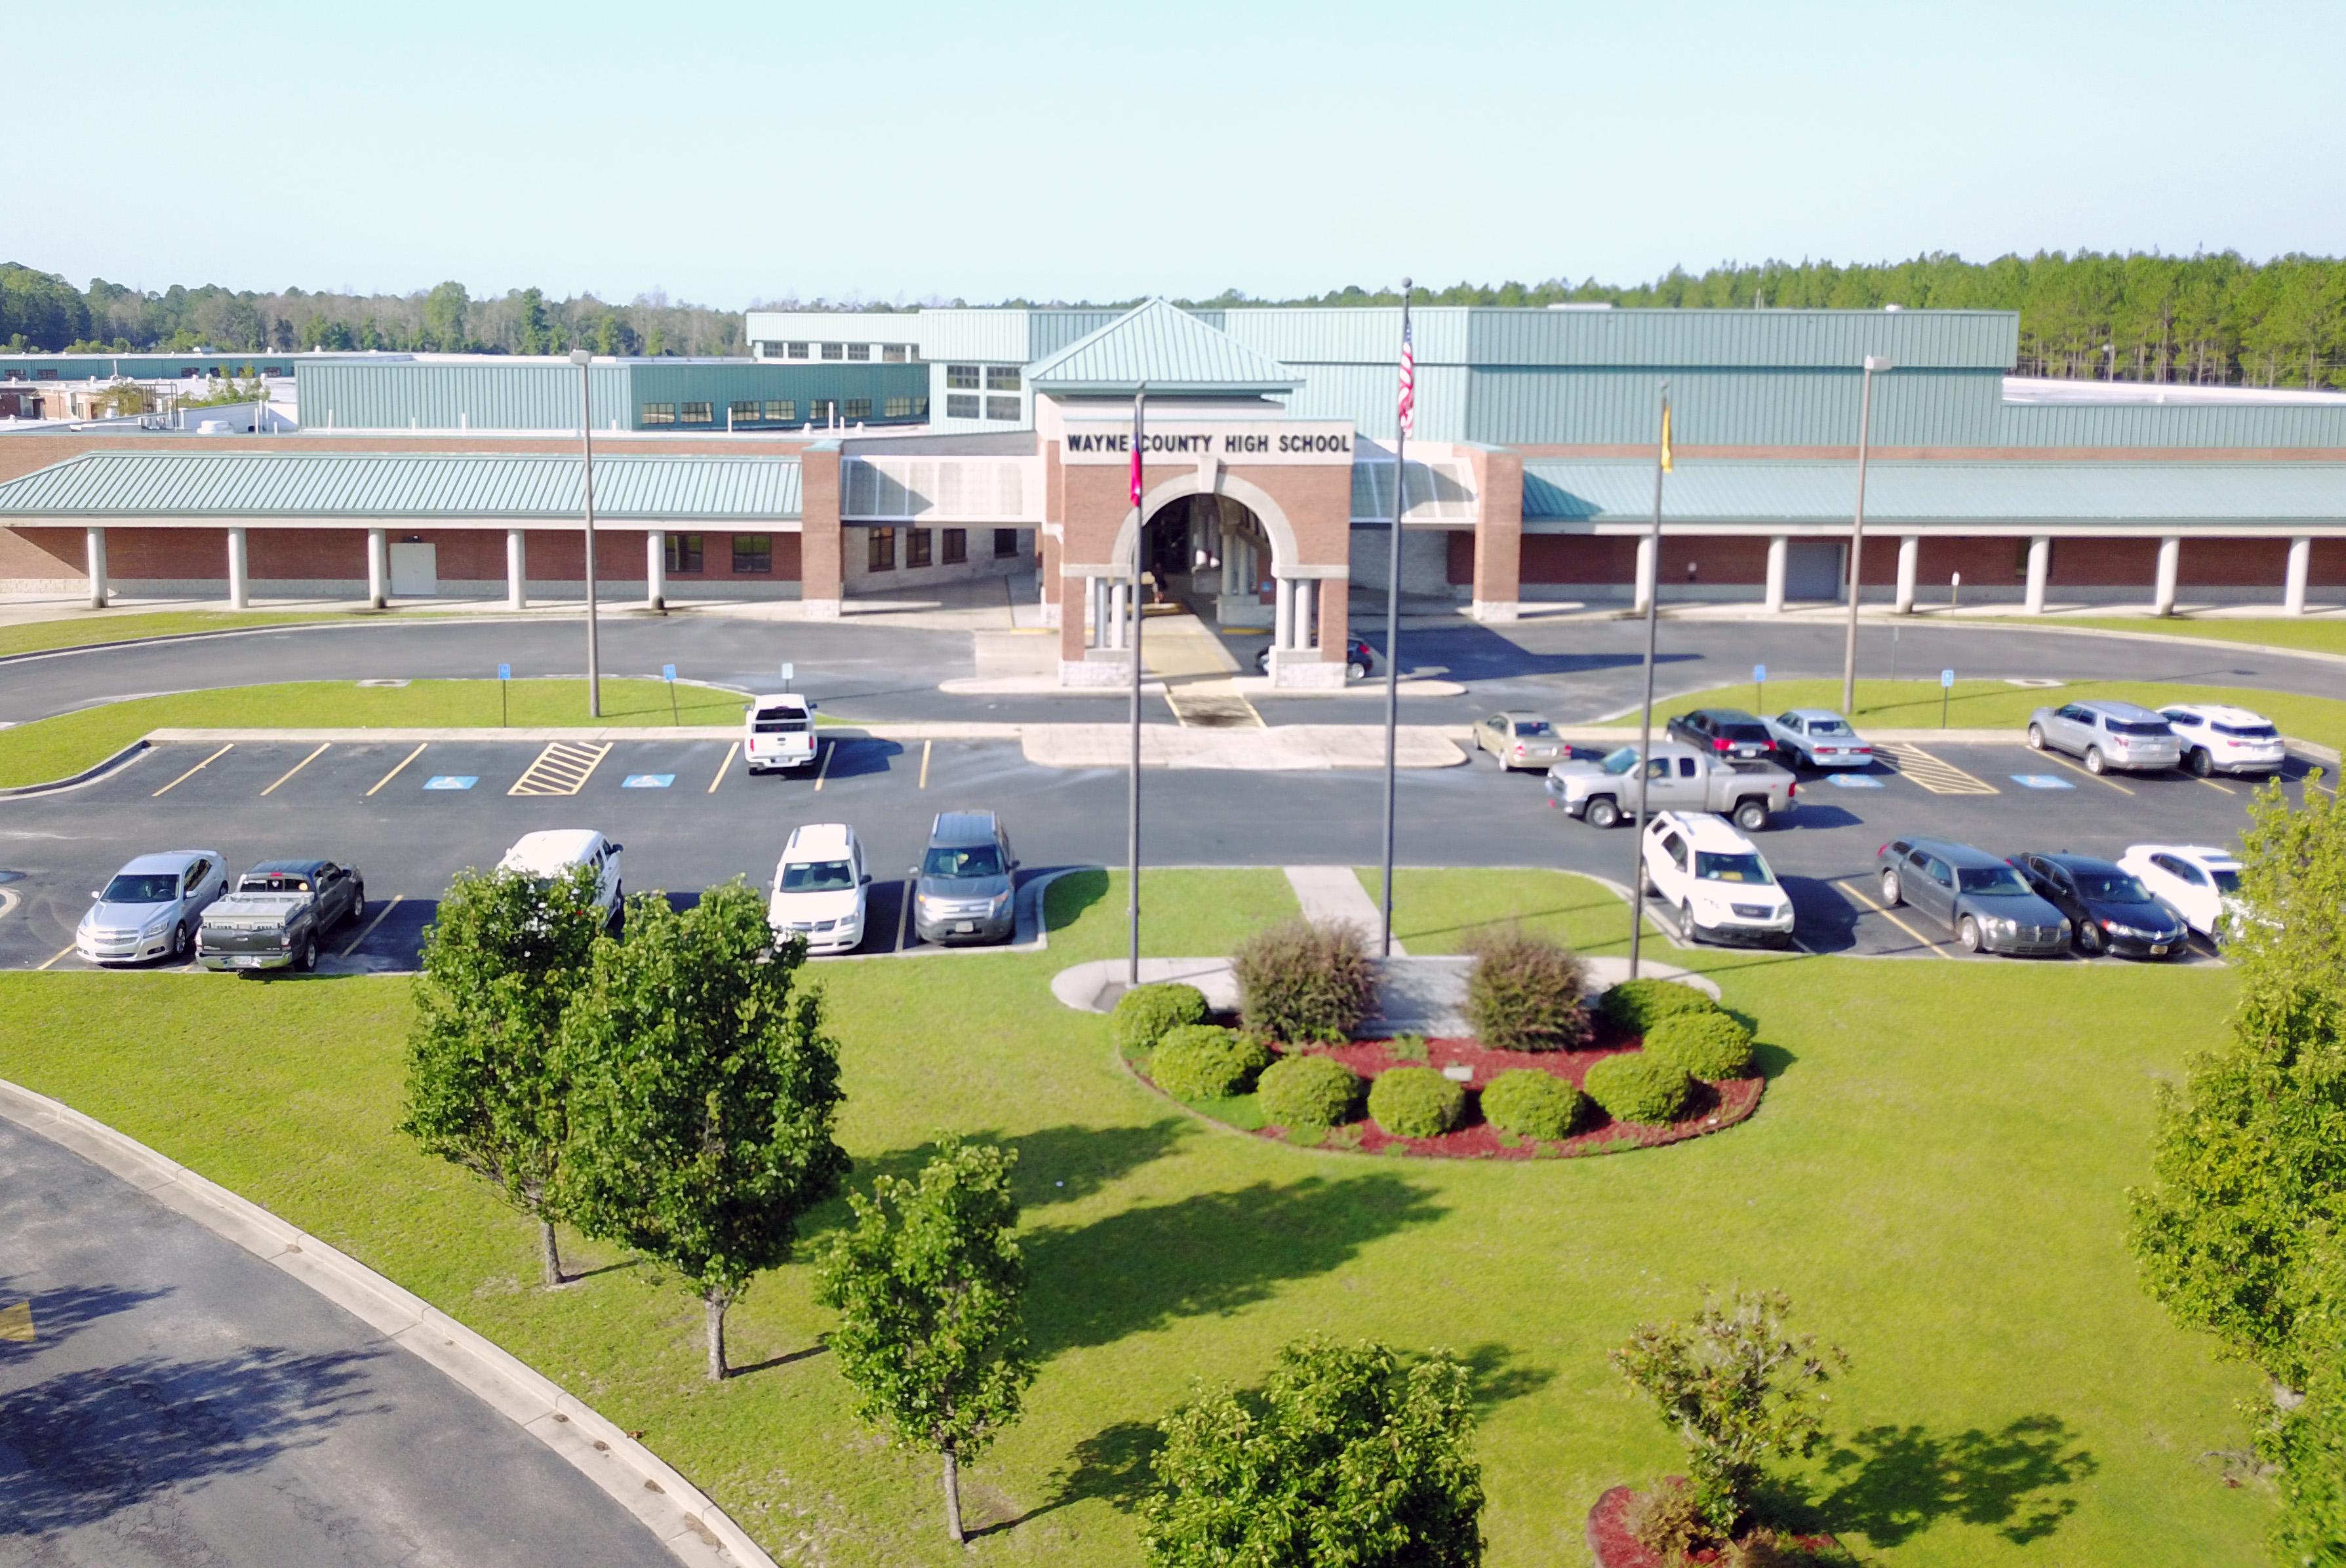 Wayne County High School